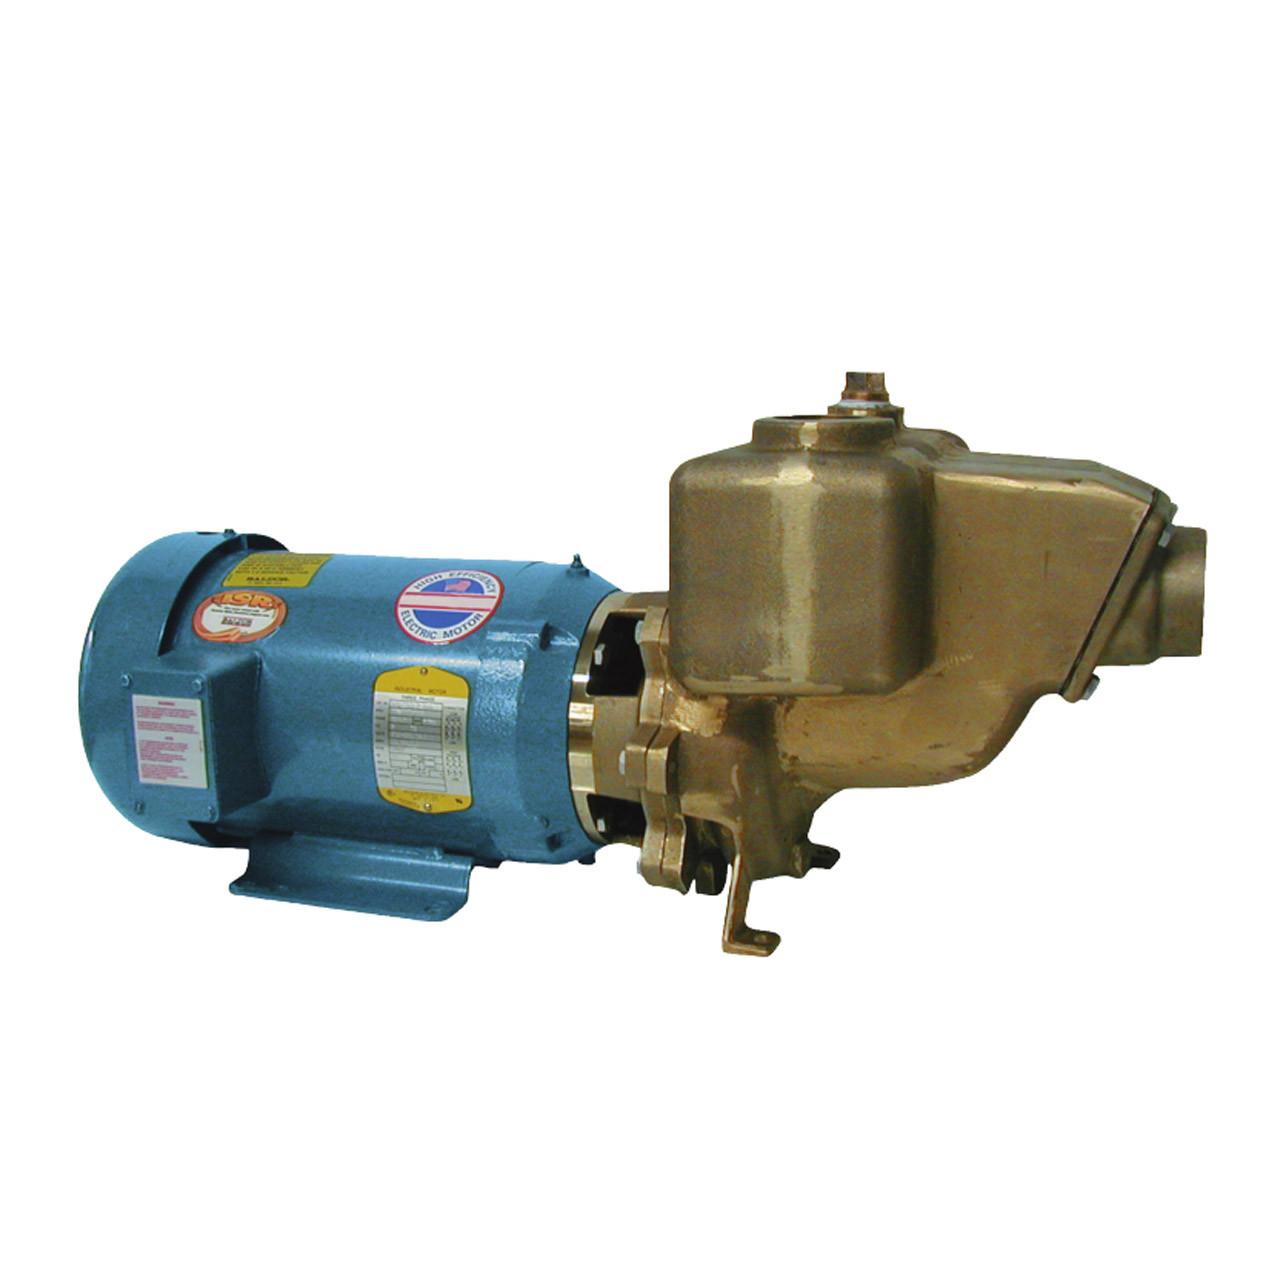 Bomba centrífuga marina Q-Pumps serie R